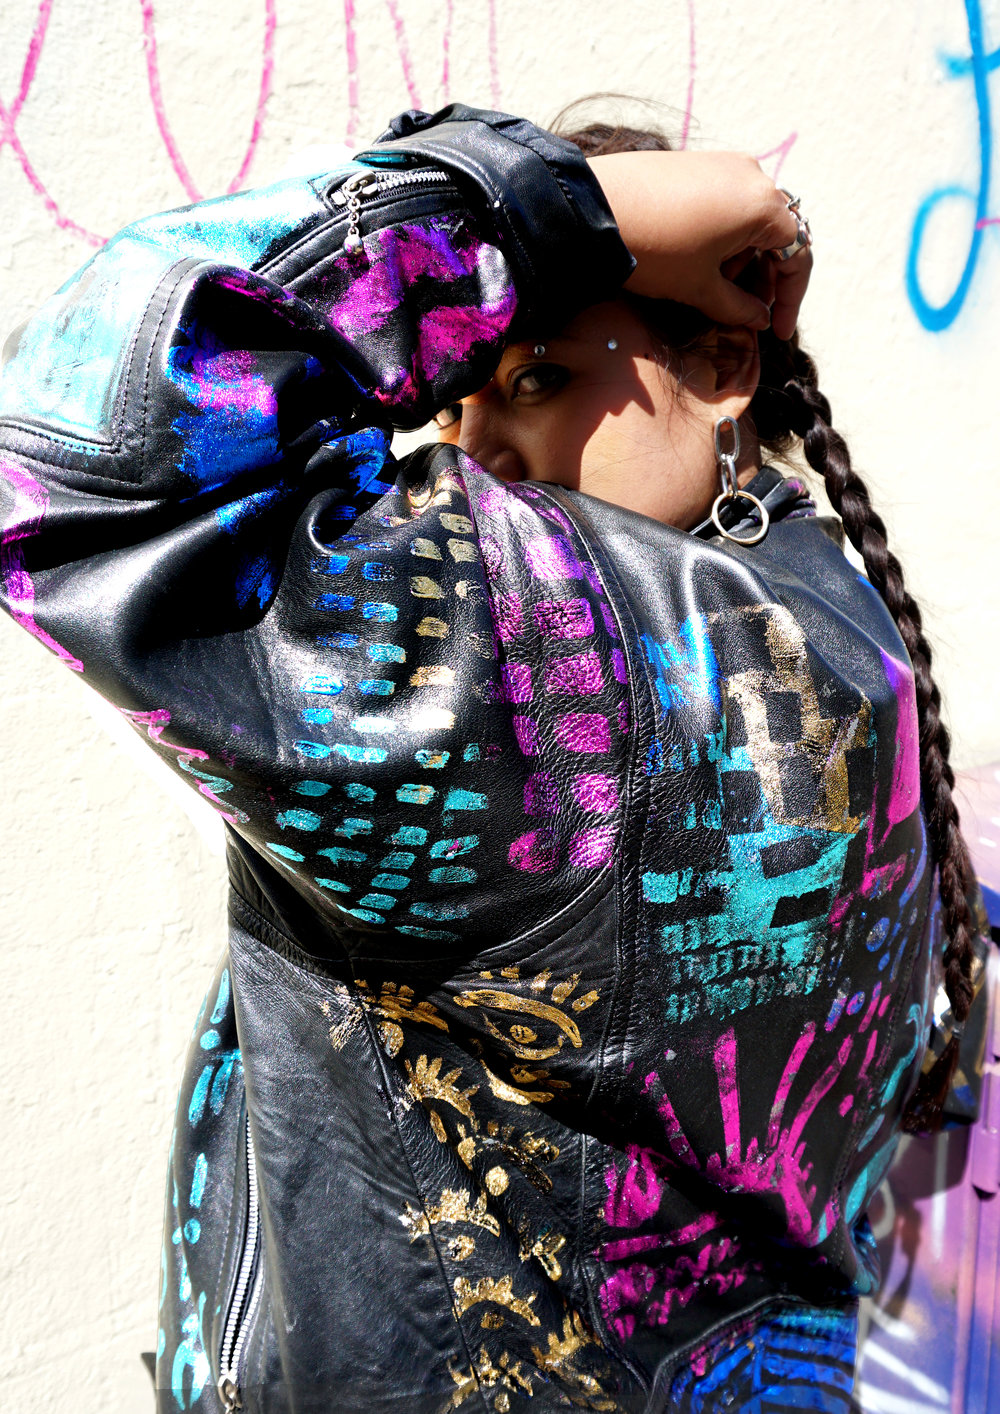 FS 6 NEONOMORA in her custom GLOBELLE by Nelly Rose Jacket .jpg